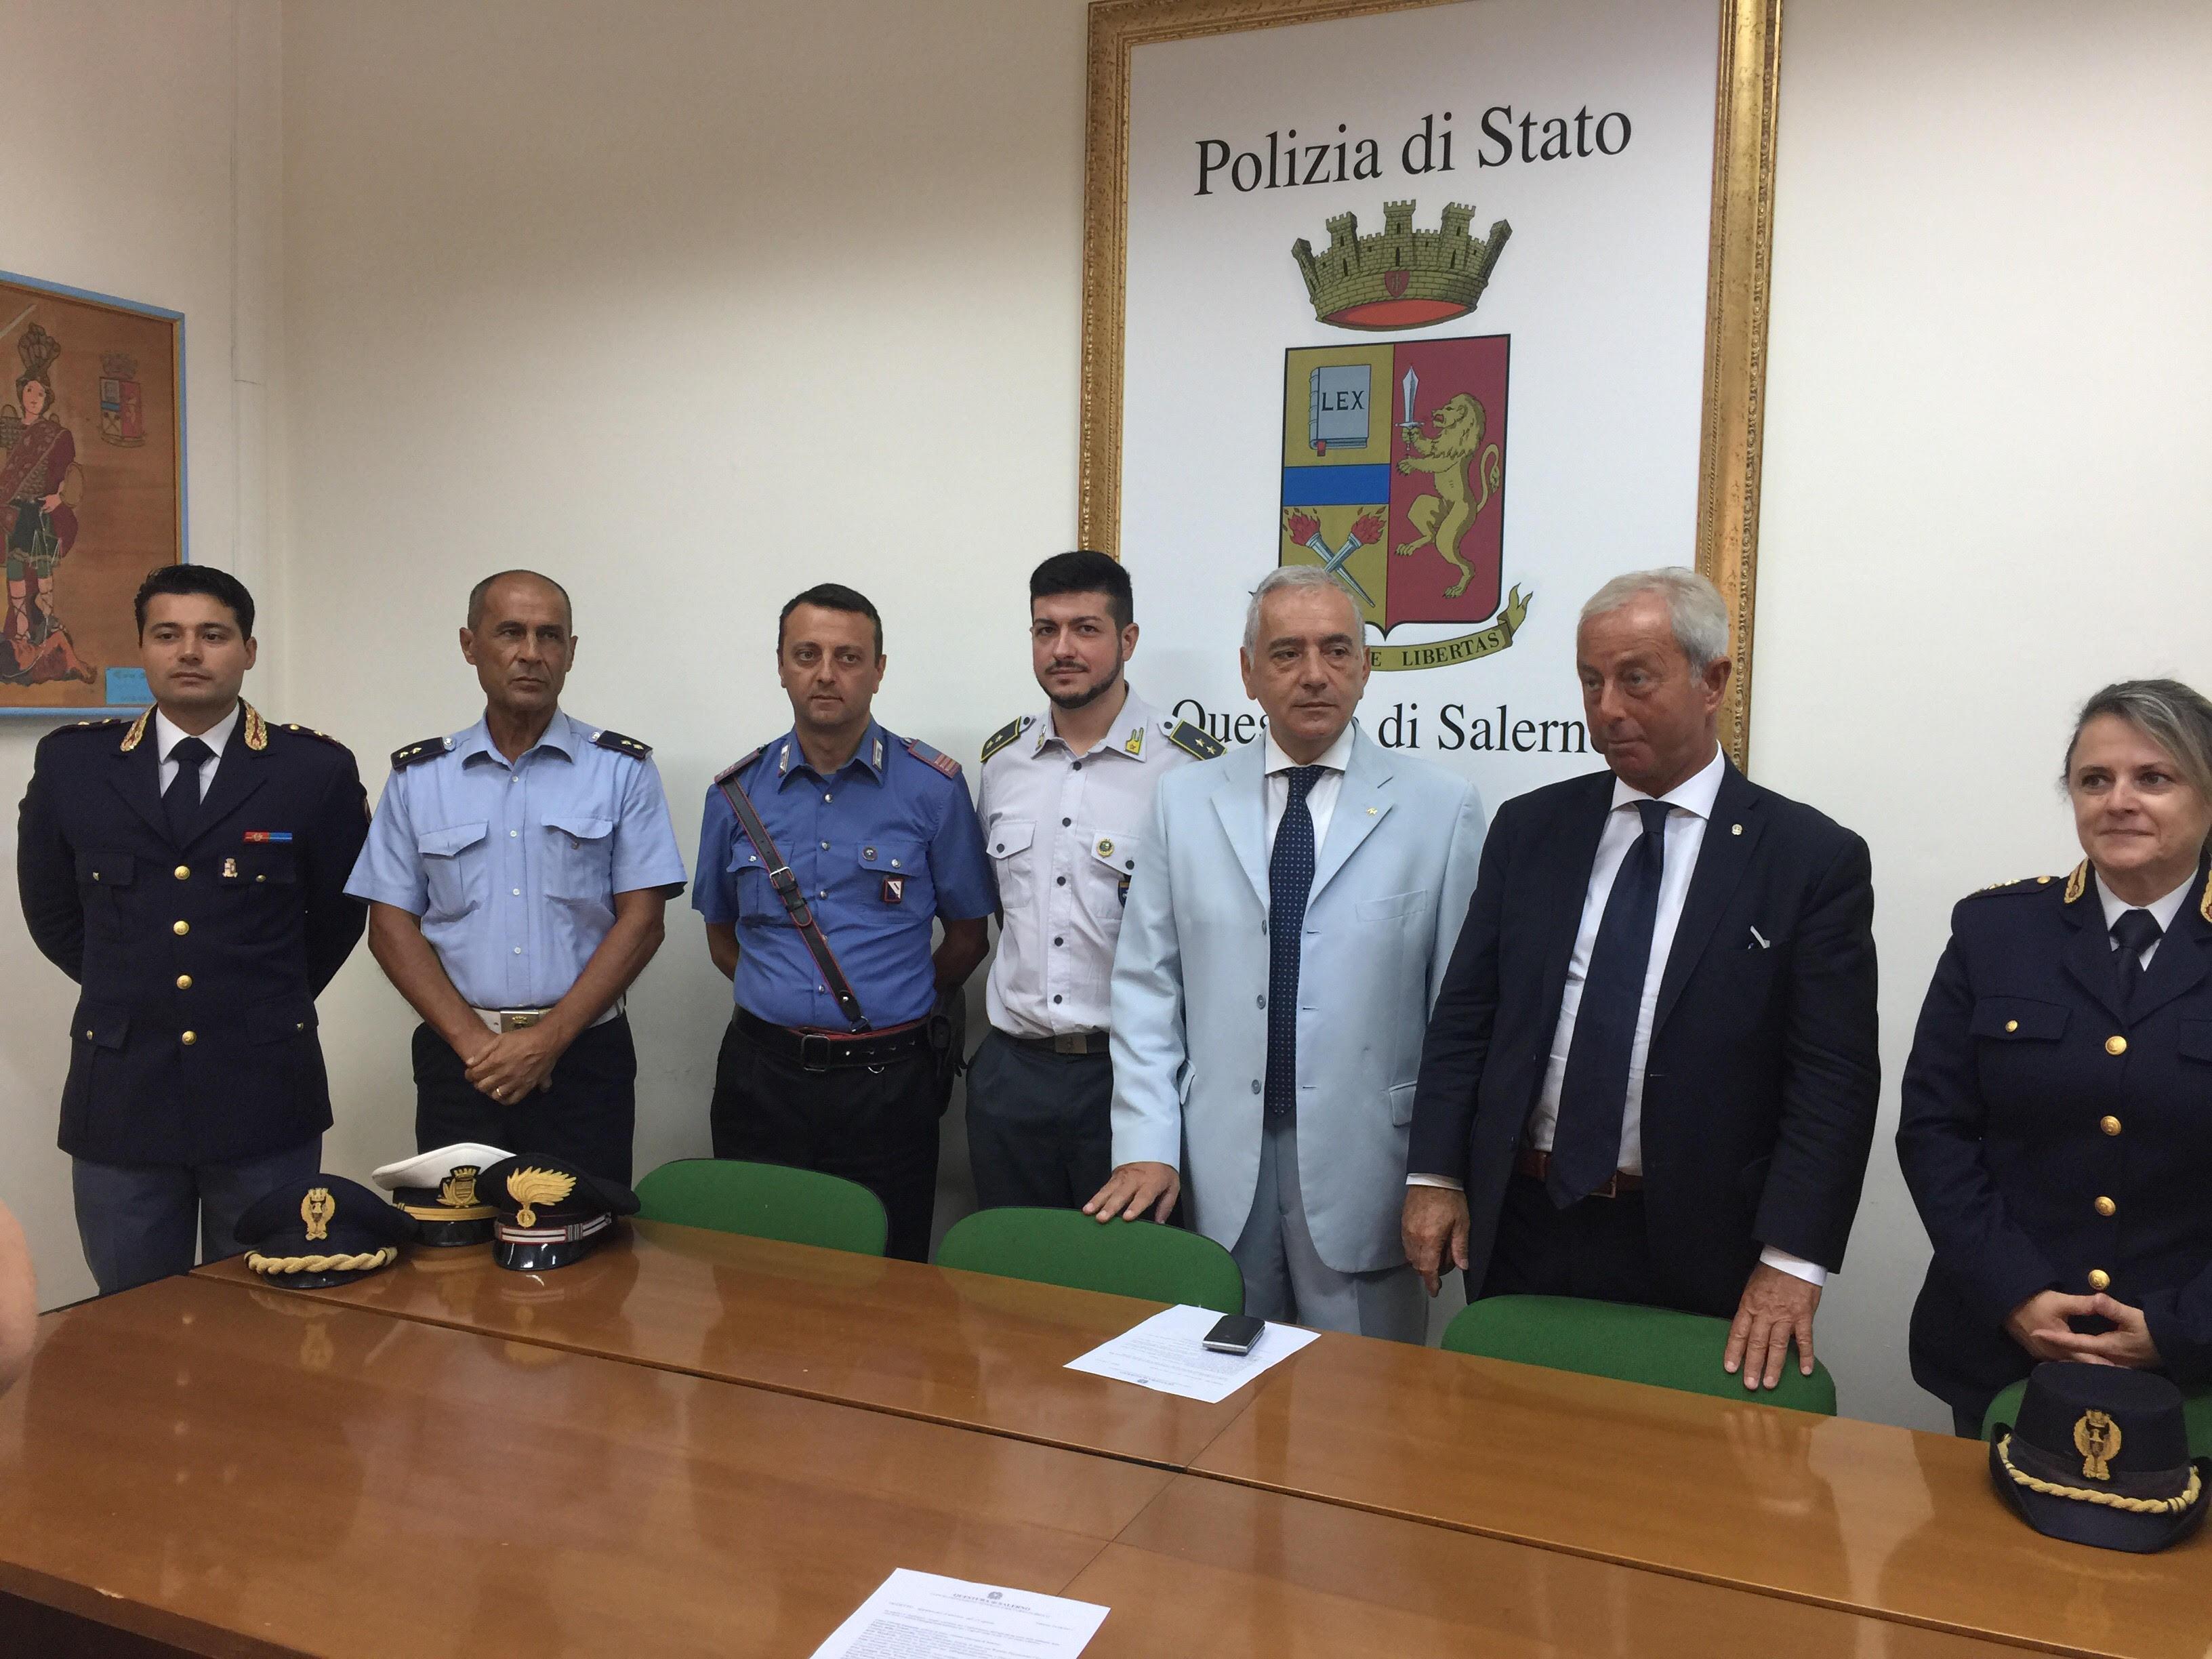 http://www.salernonotizie.net/wp-content/uploads/2017/08/polizia22.jpg